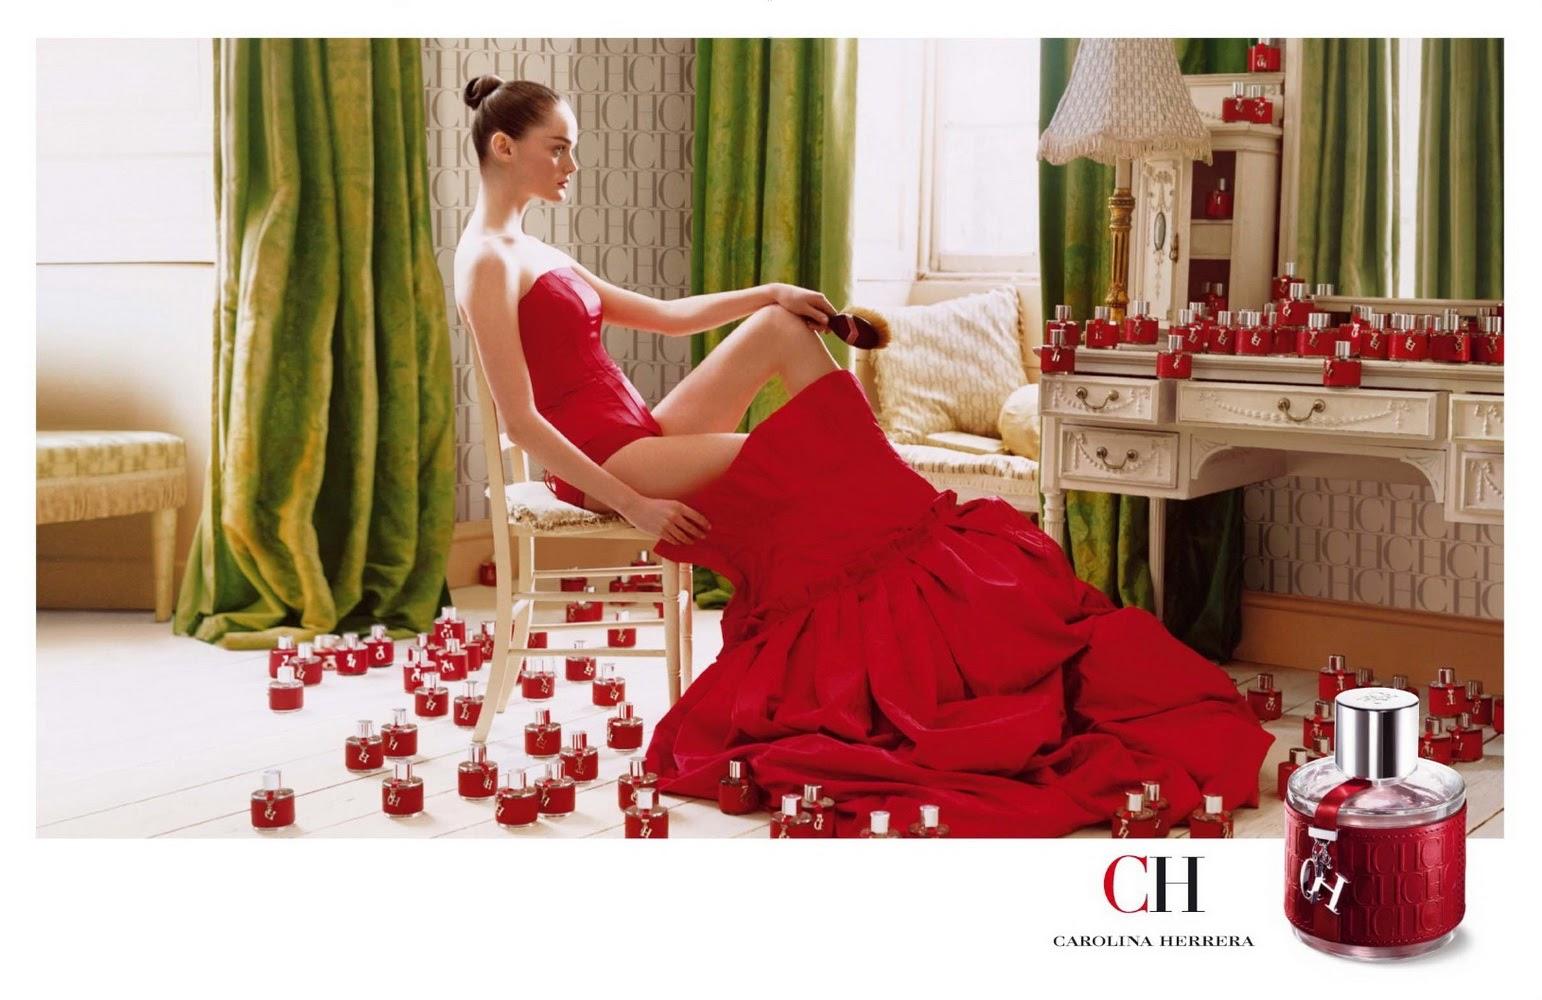 Presente Dia das Mães - Perfume CH Carolina Herrera